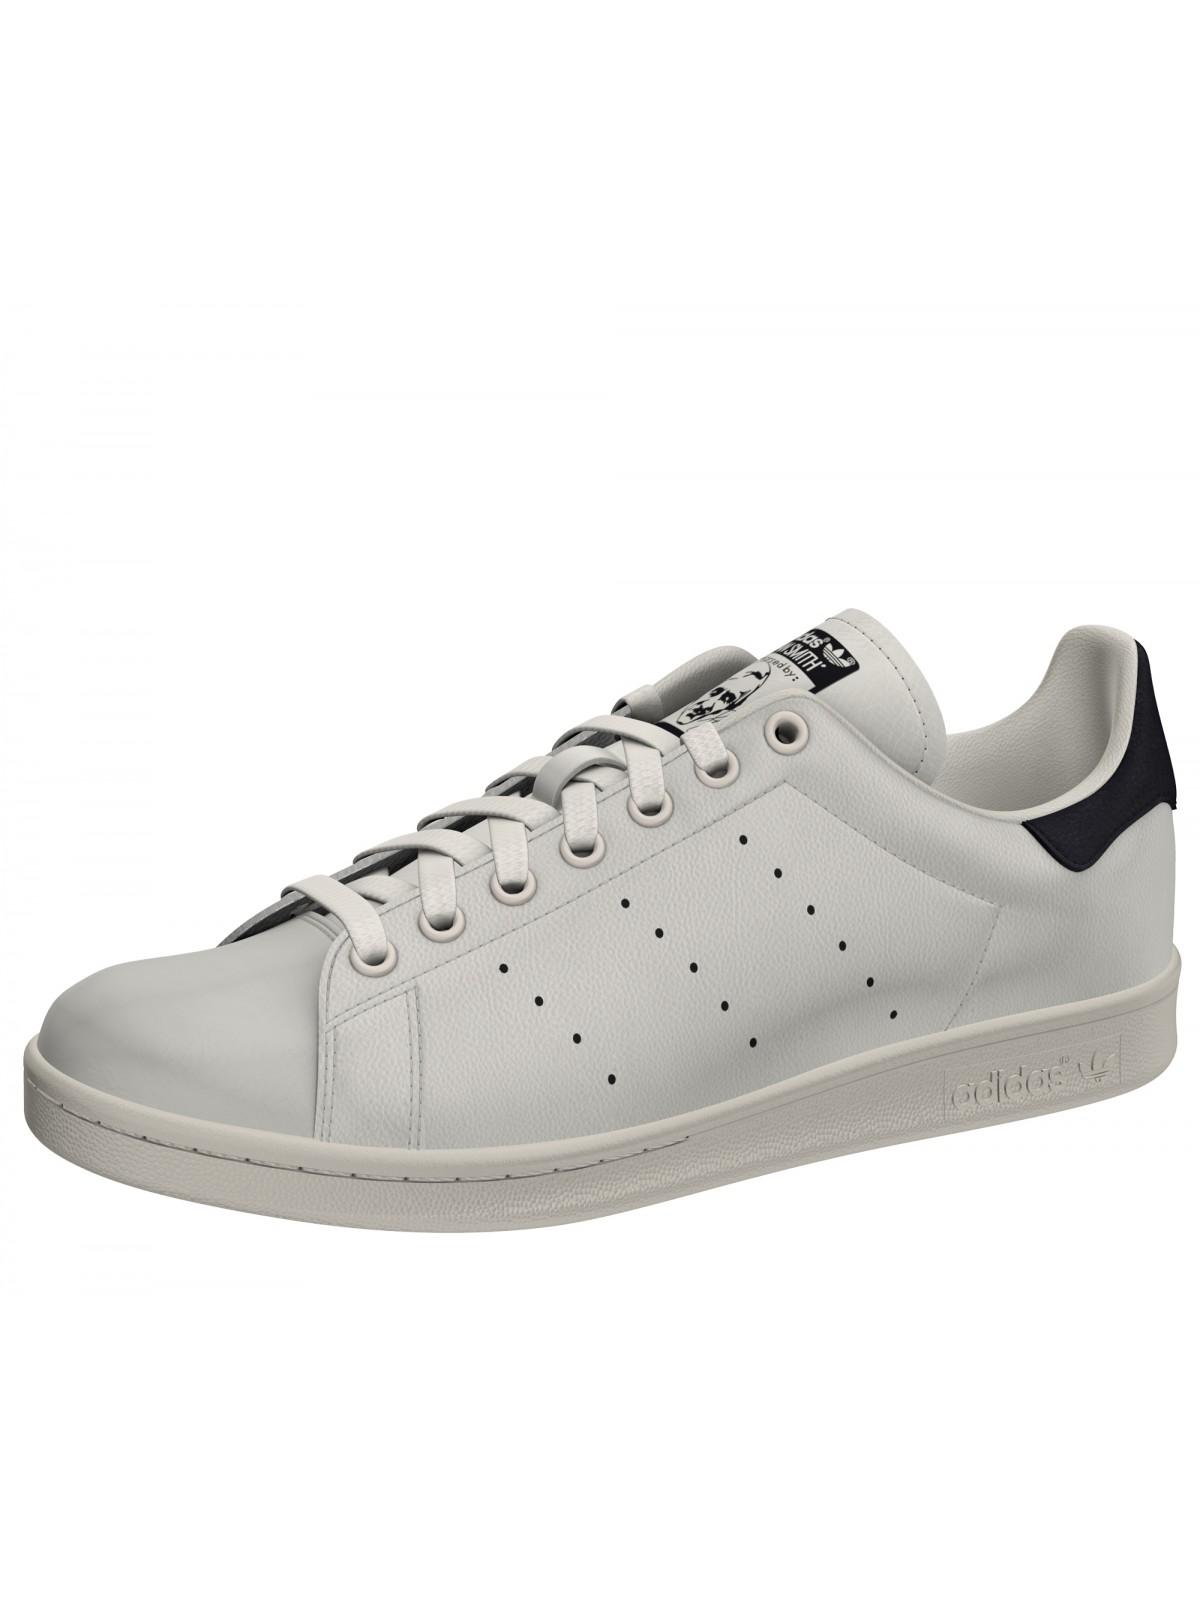 Adidas Stan Smith cuir crème / noir